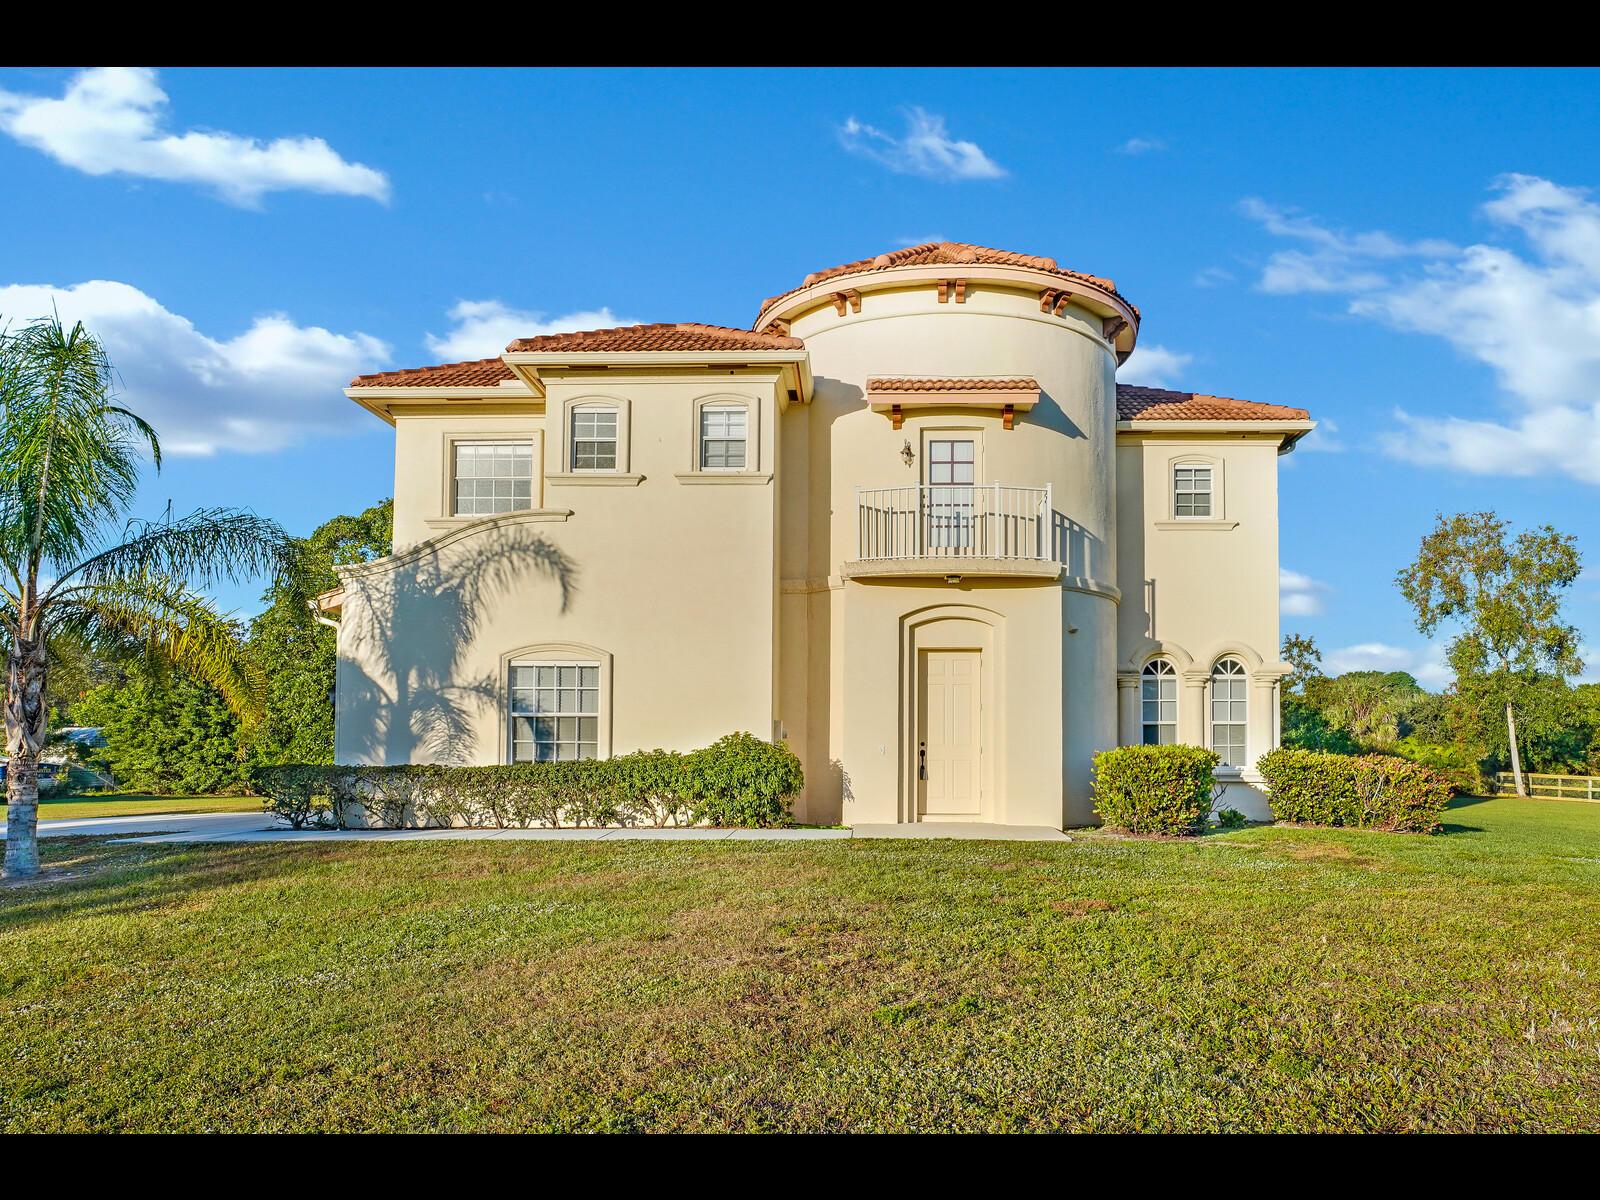 16383  73rd Terrace  For Sale 10720491, FL